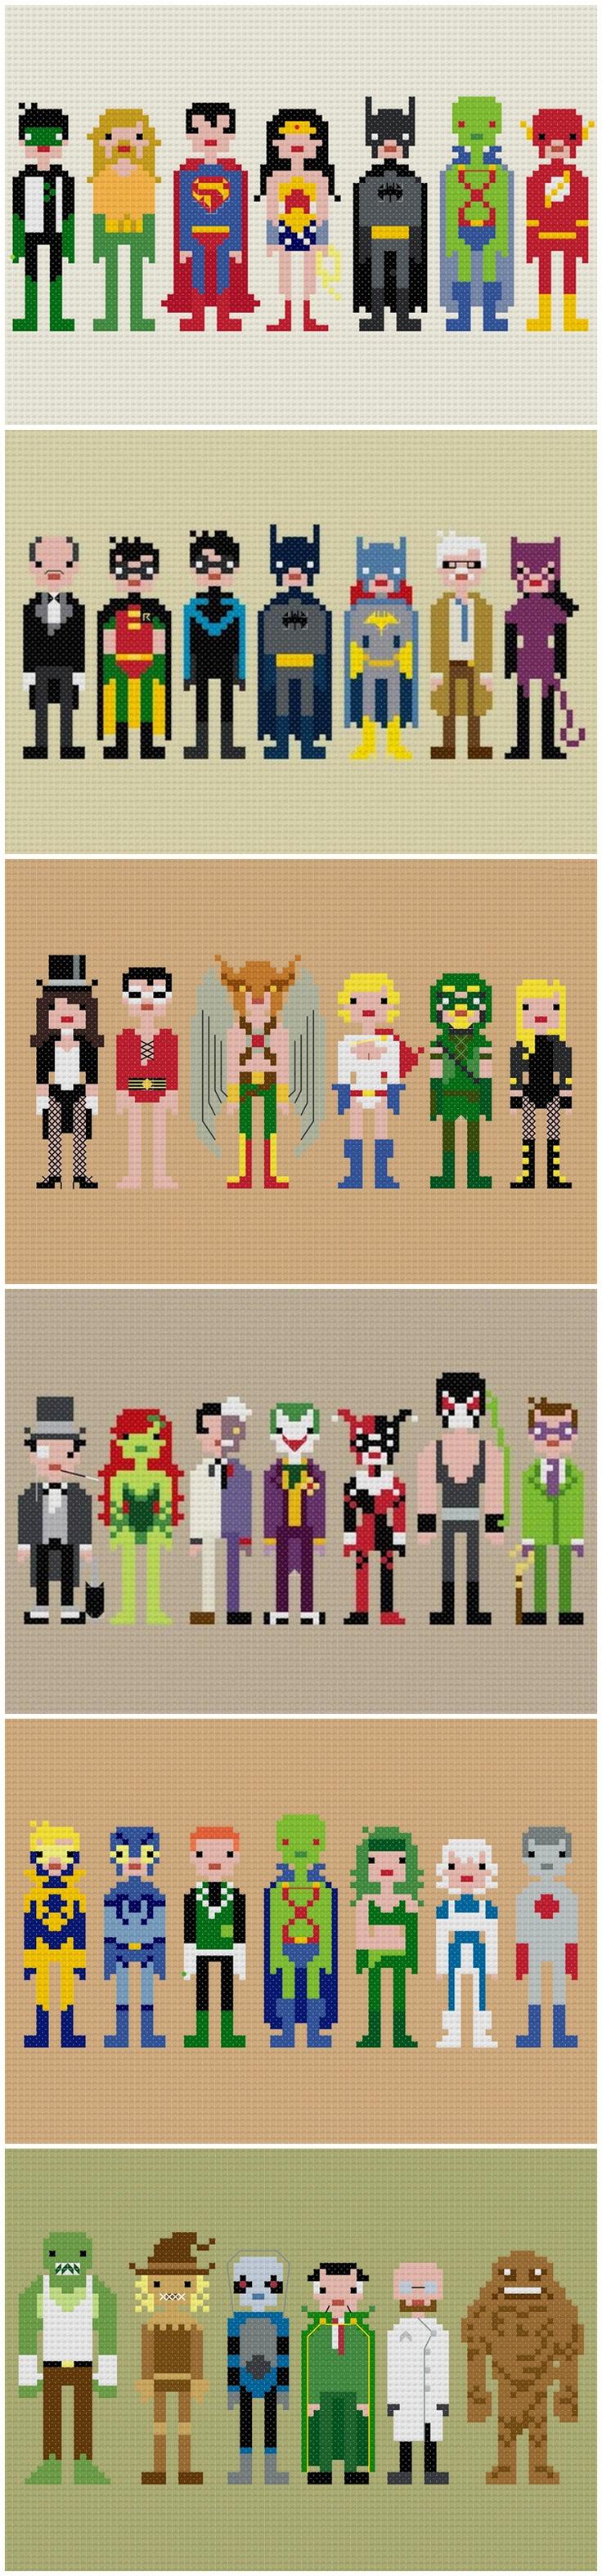 Weelittlestitches contemporary cross stitch Justice League and Batman patterns {etsy.com/shop/weelittlestitches}